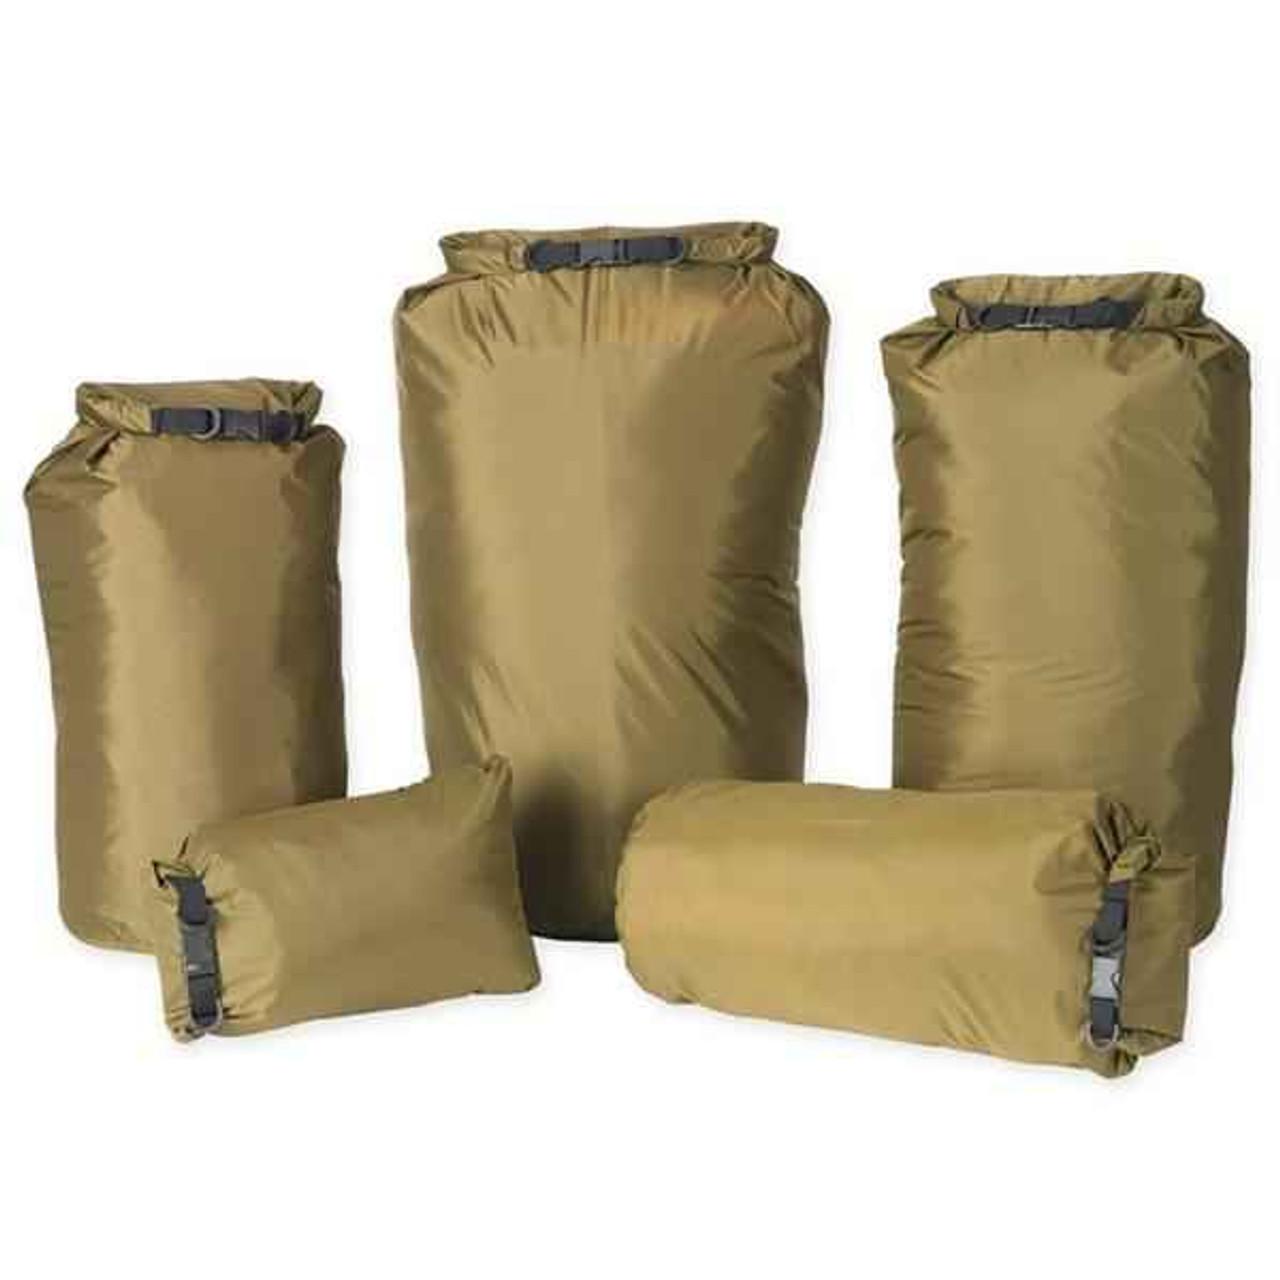 Pro Force Dri-Sak Waterproof Bag - XX Large, Coyote